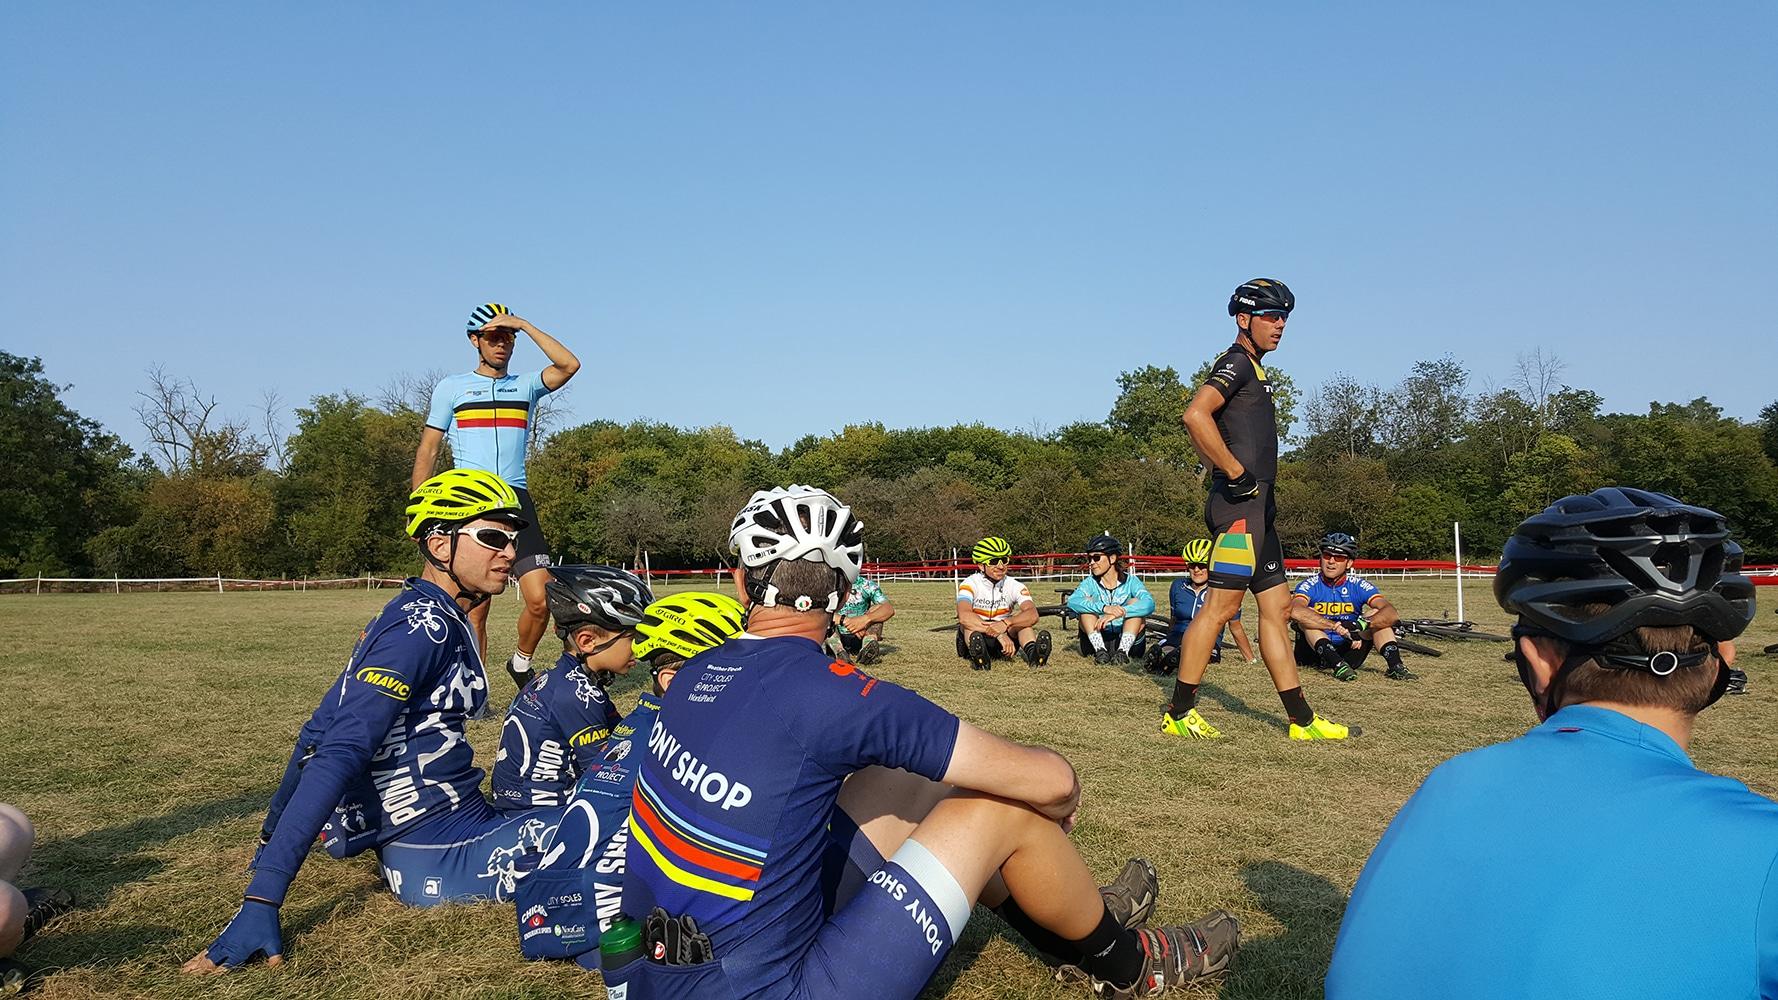 Sven Nys Cyclocross Clinic